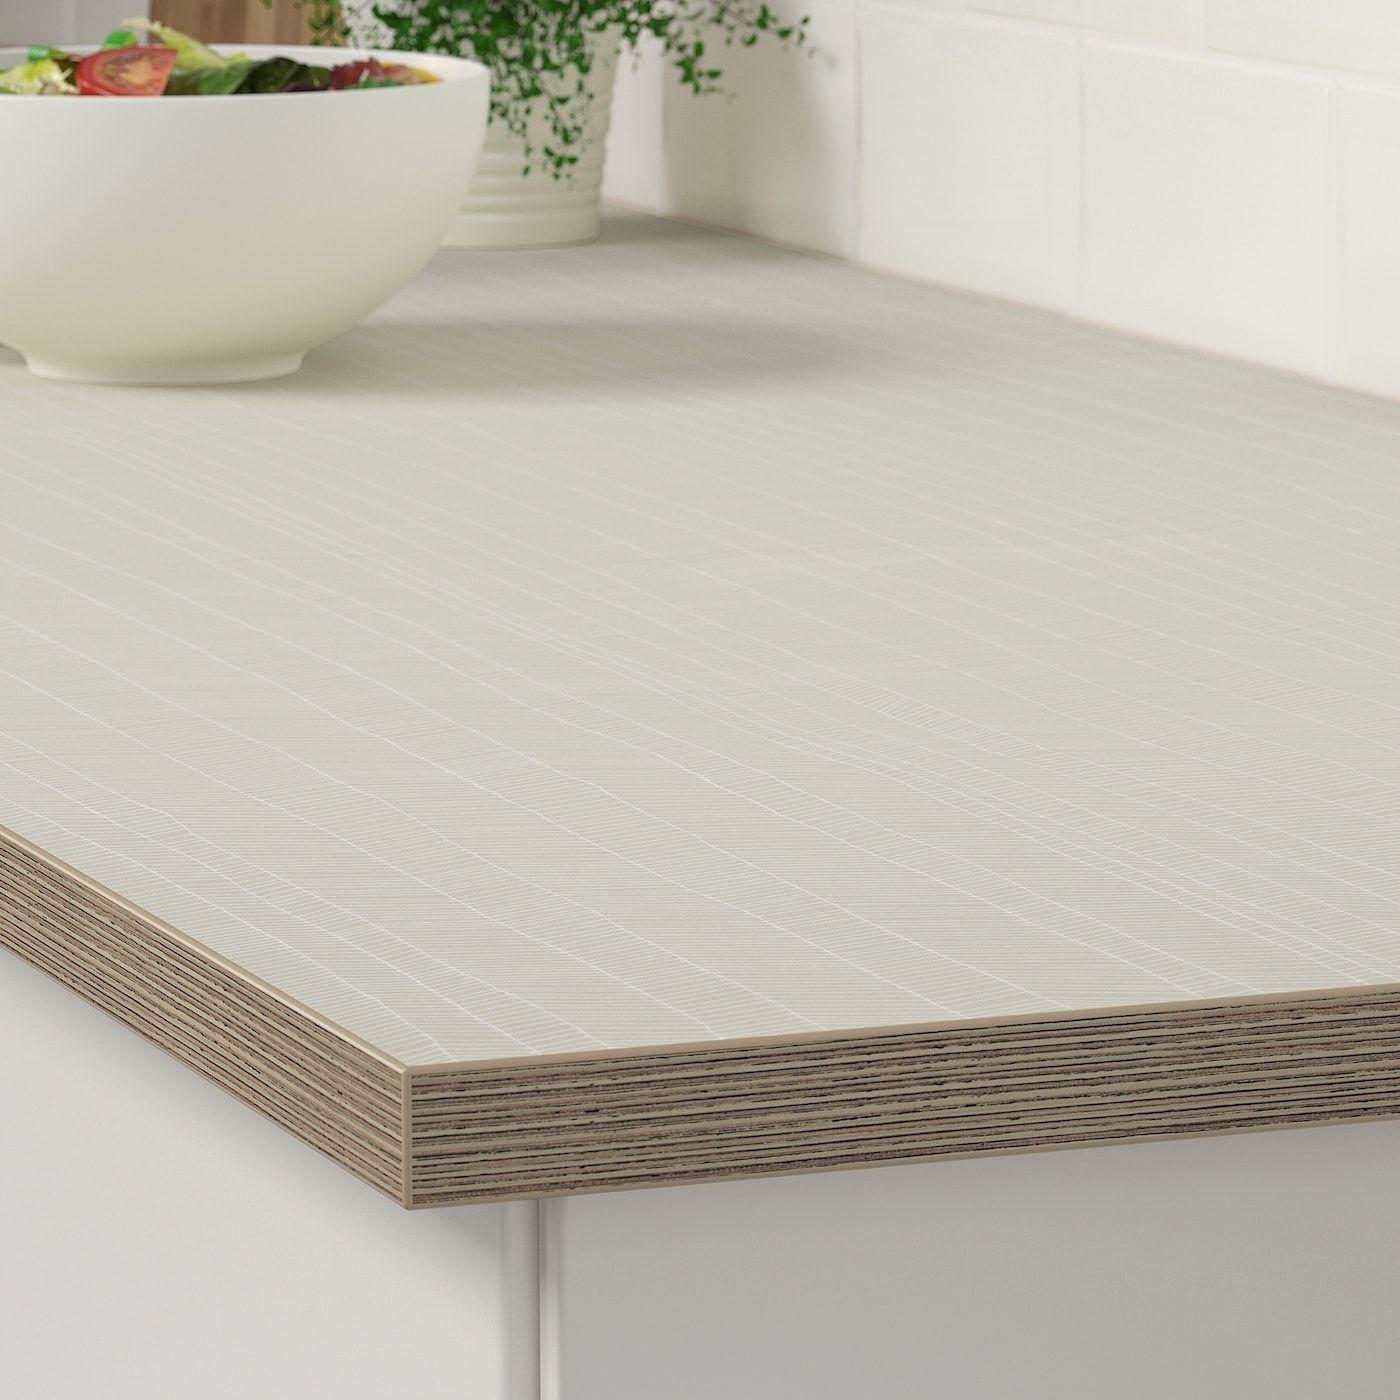 Ekbacken Arbeitsplatte Mattiert Beige Gemustert Laminat Ikea Osterreich Laminate Countertops Countertops Laminate